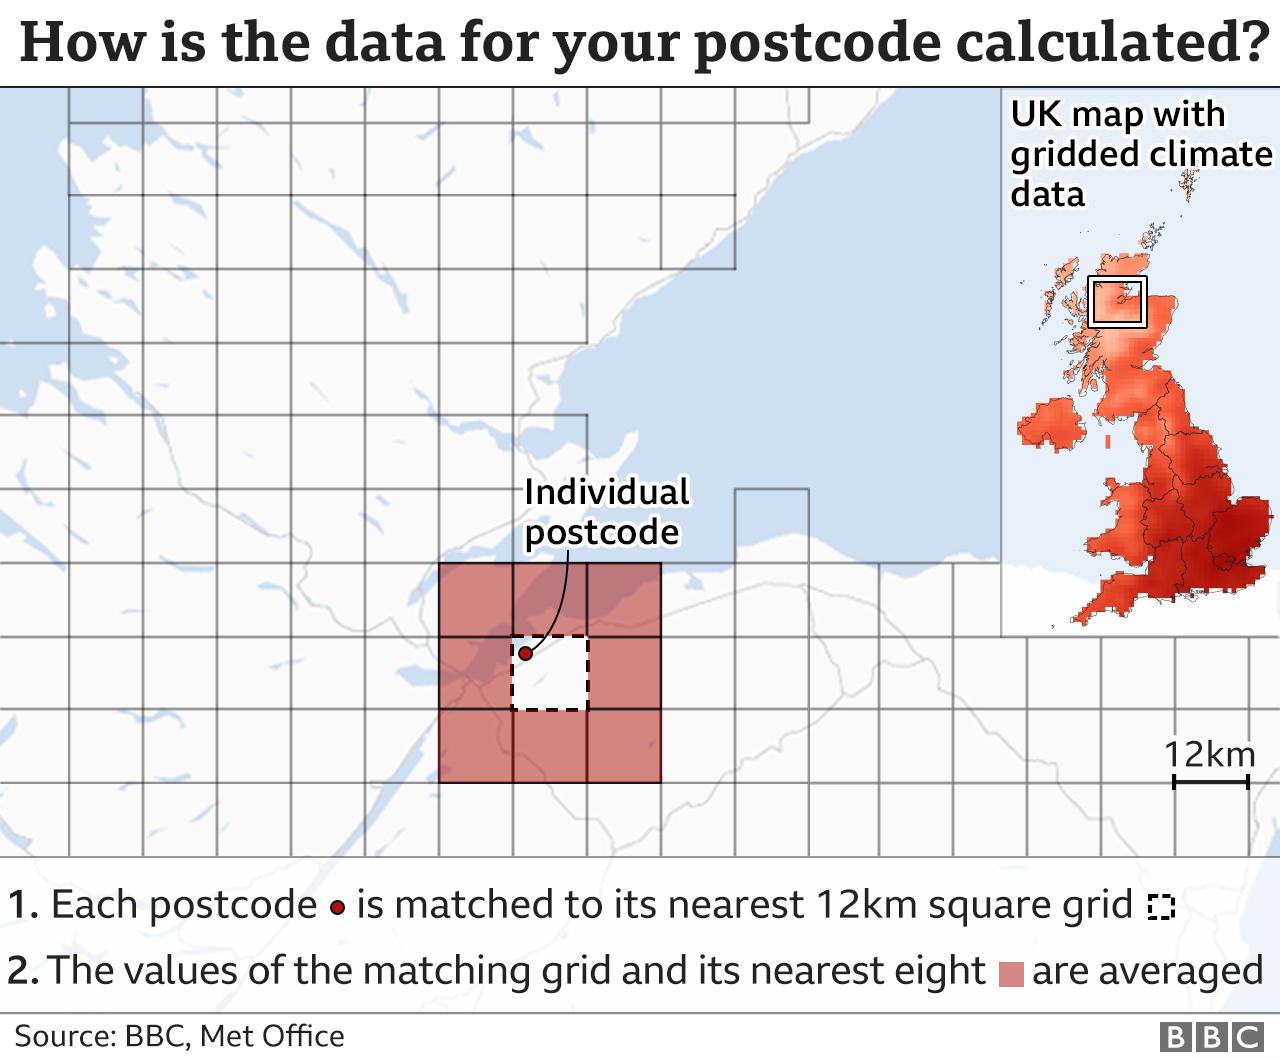 https://c.files.bbci.co.uk/10D20/production/_115769886_methodology_graphic_climate_change_grids_v2-nc.png